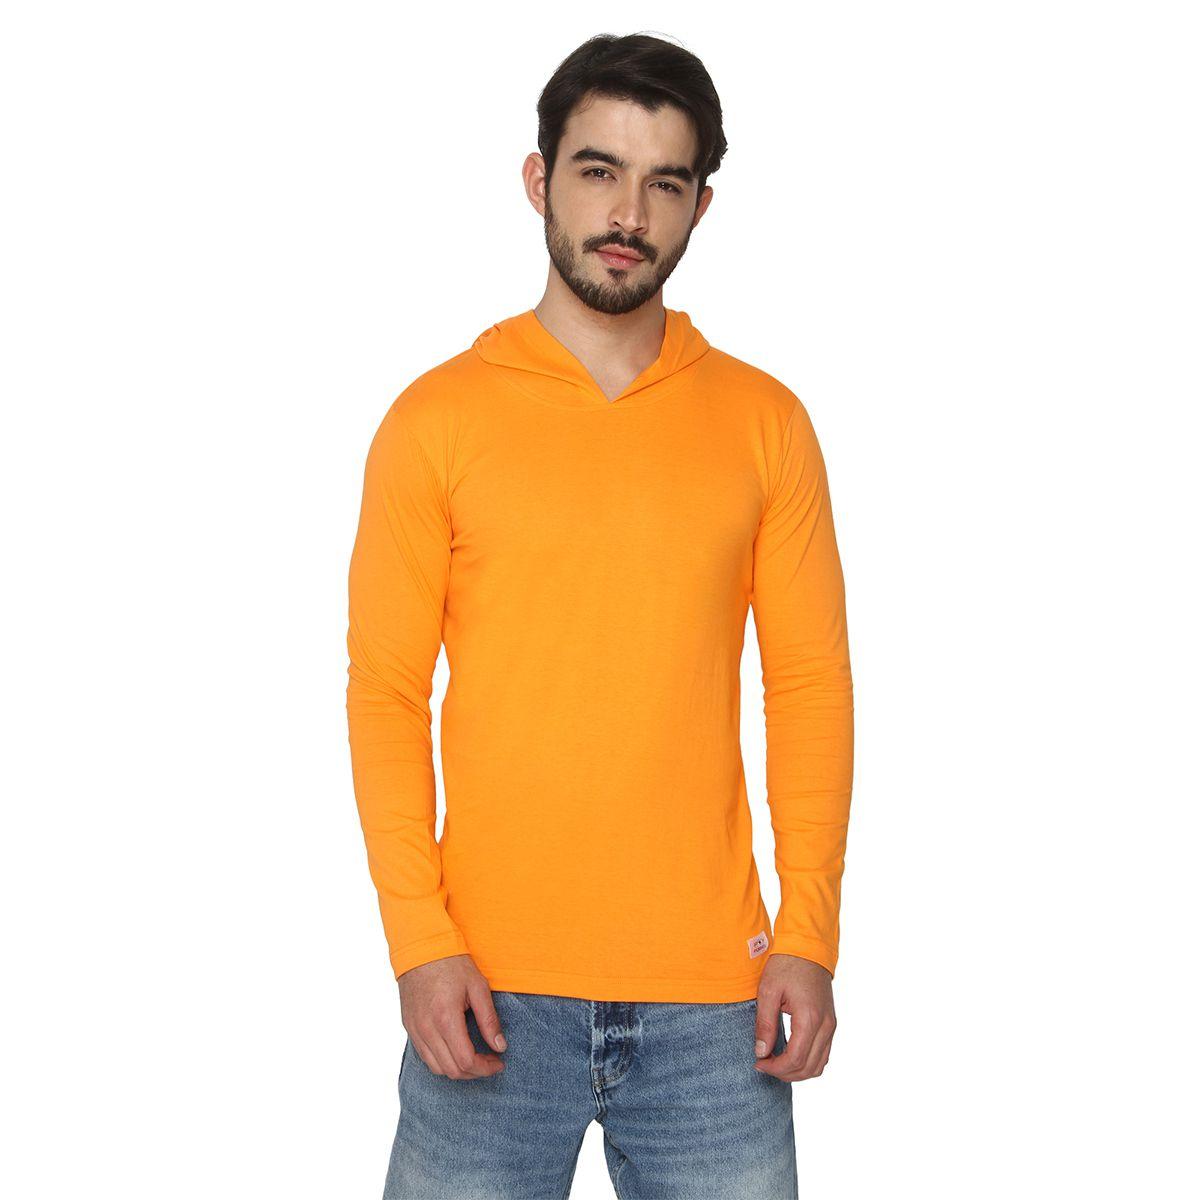 Foryou Orange Hooded T-Shirt